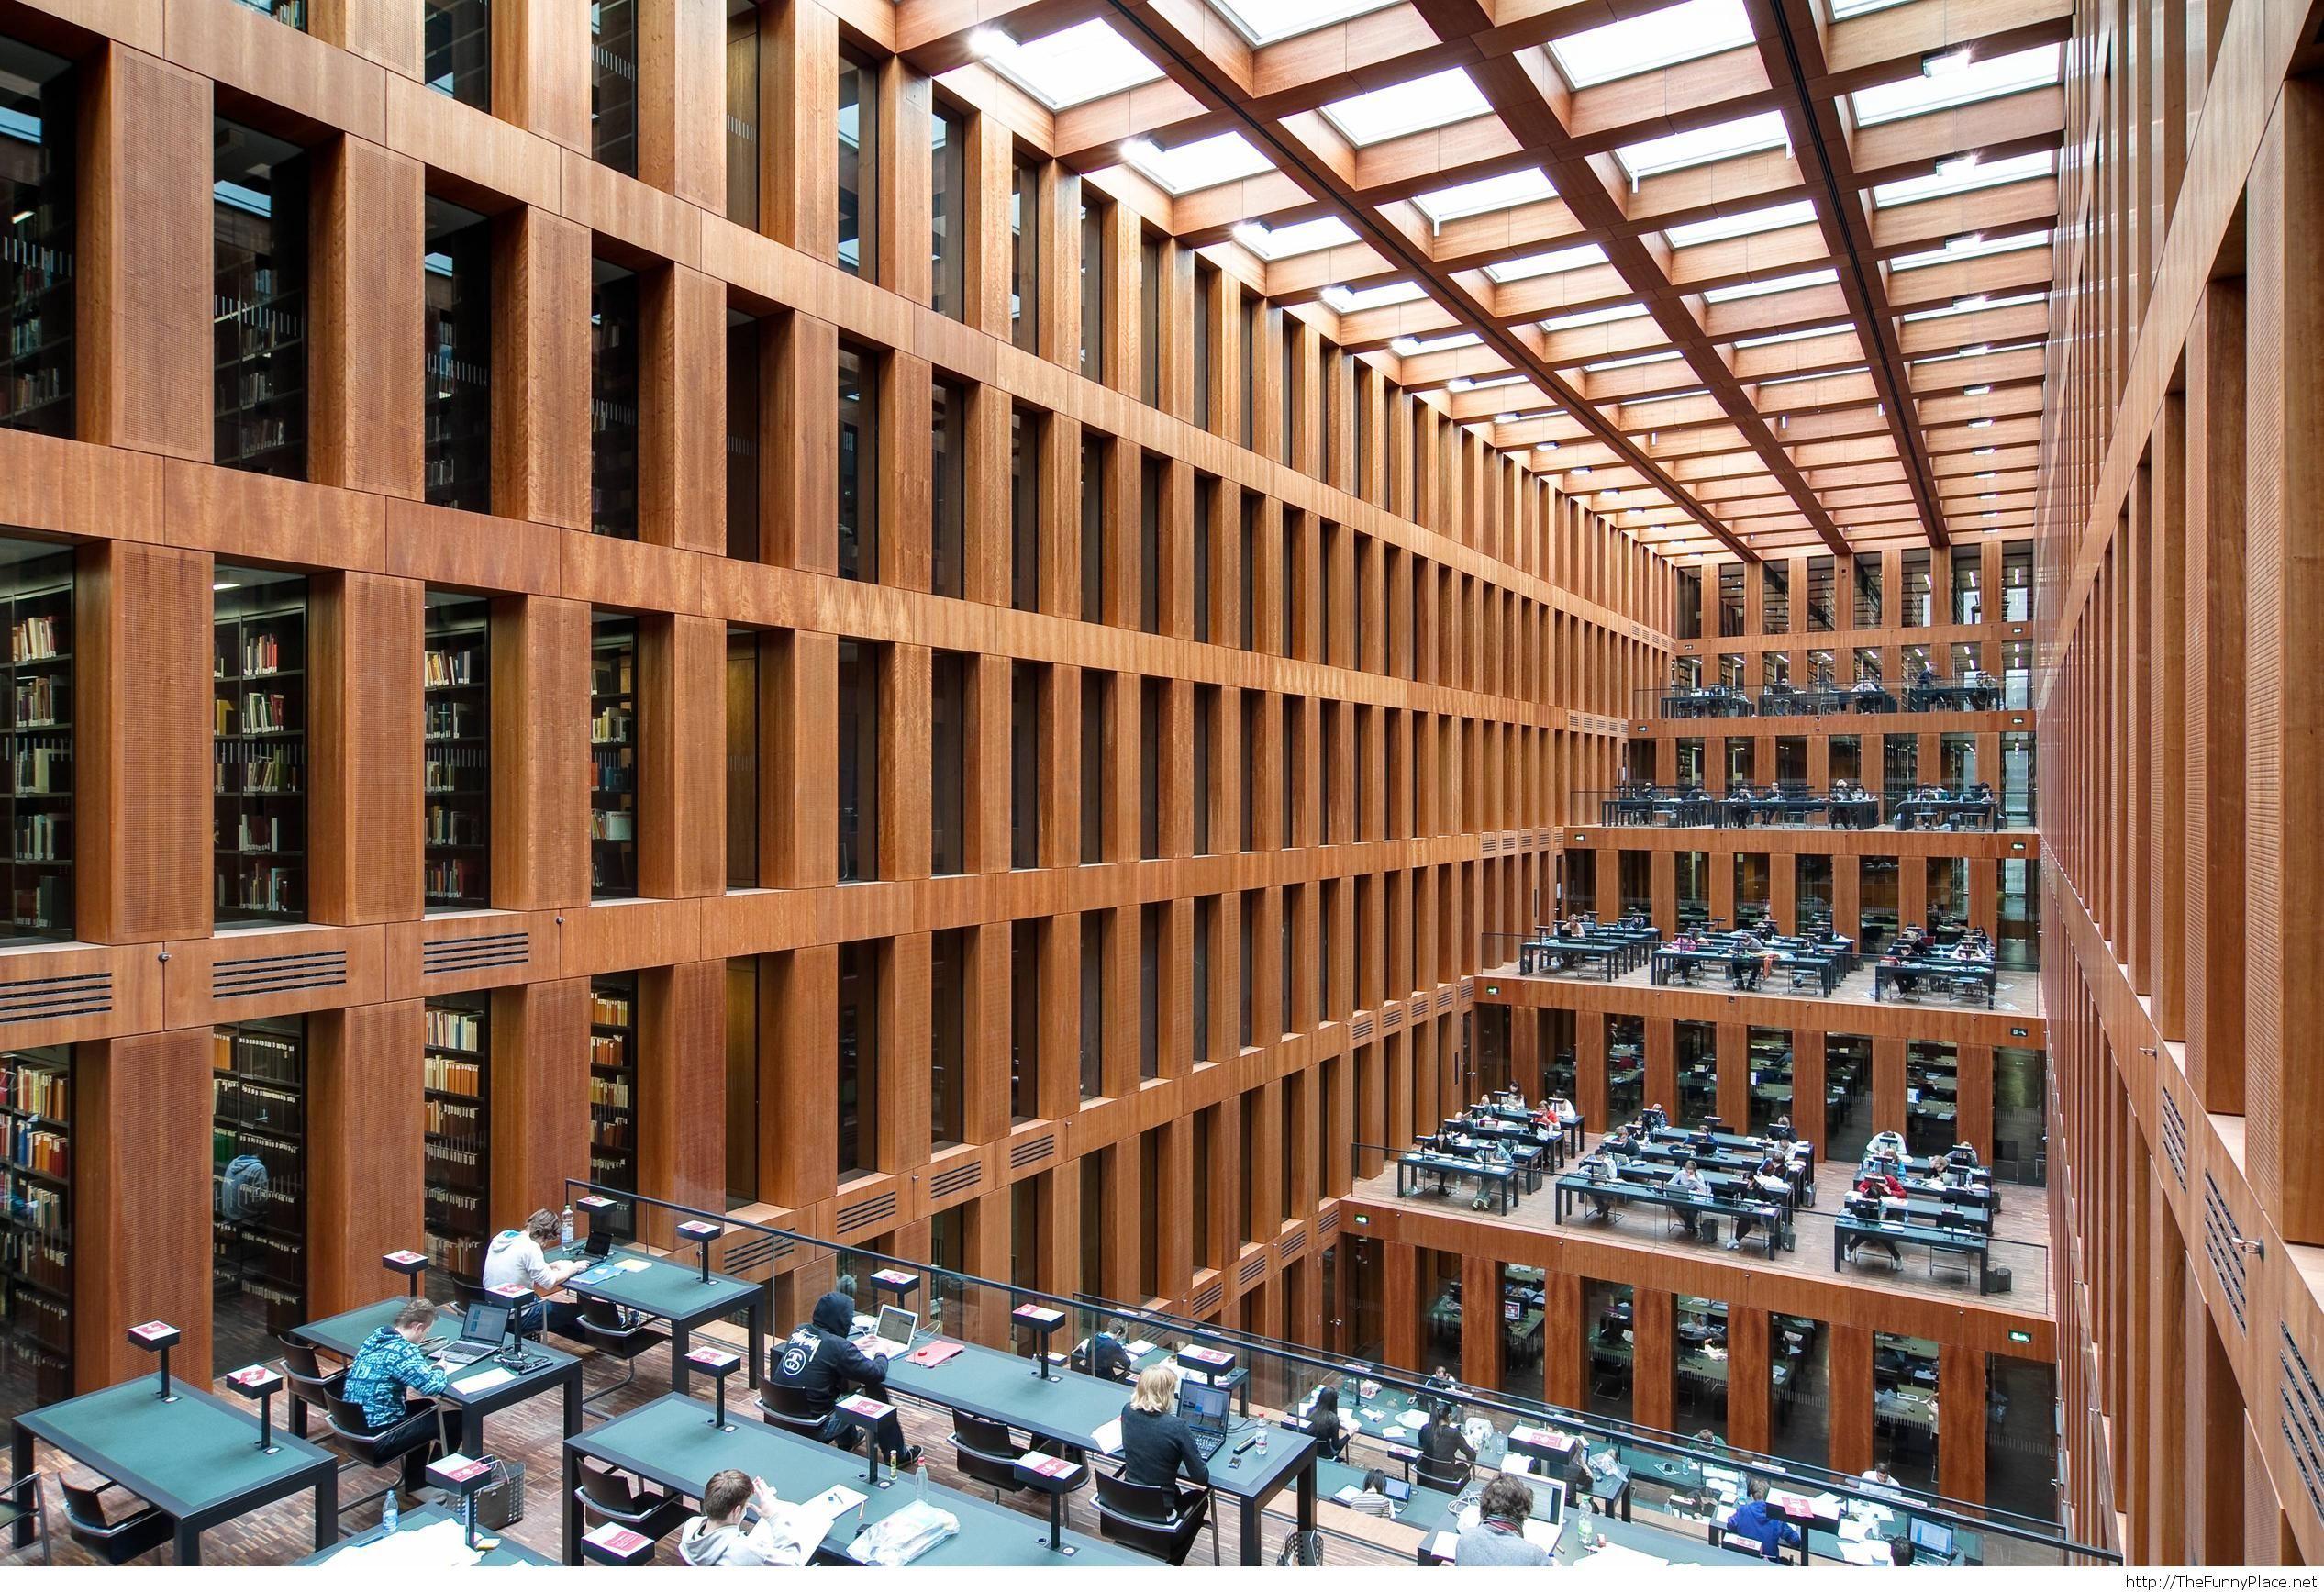 Library of Humboldt, Berlin University